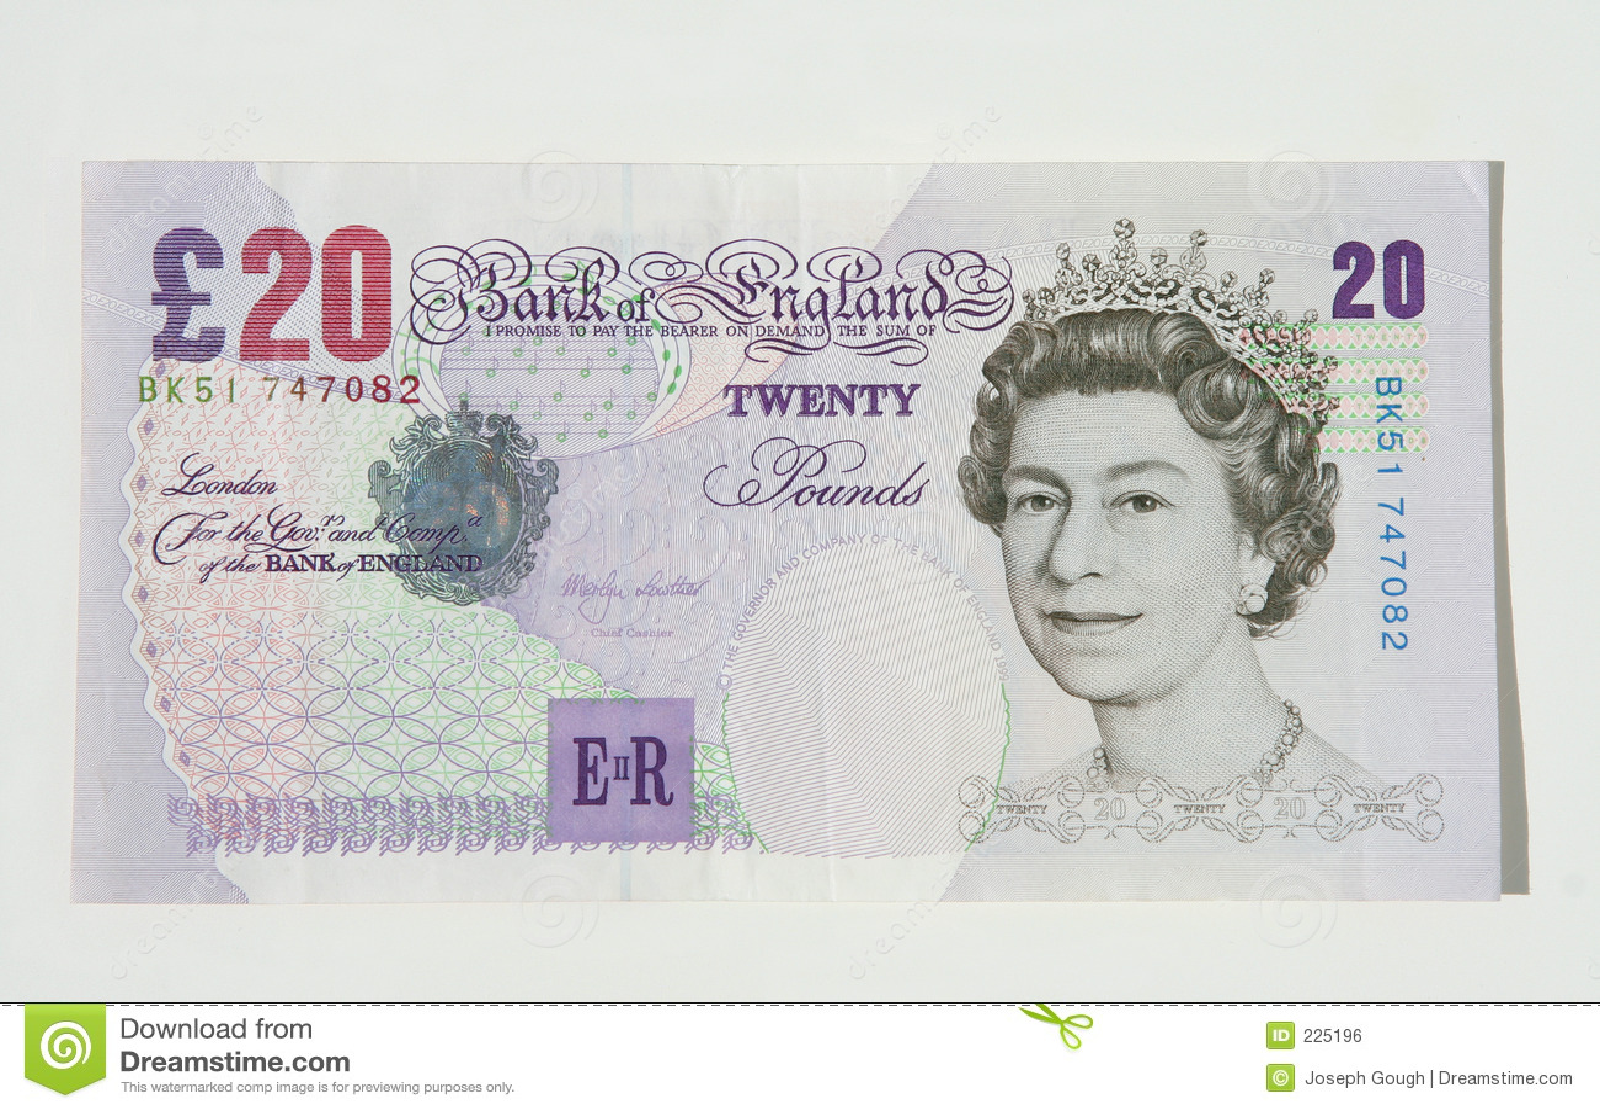 De Nota van twintig Pond, Britse Munt